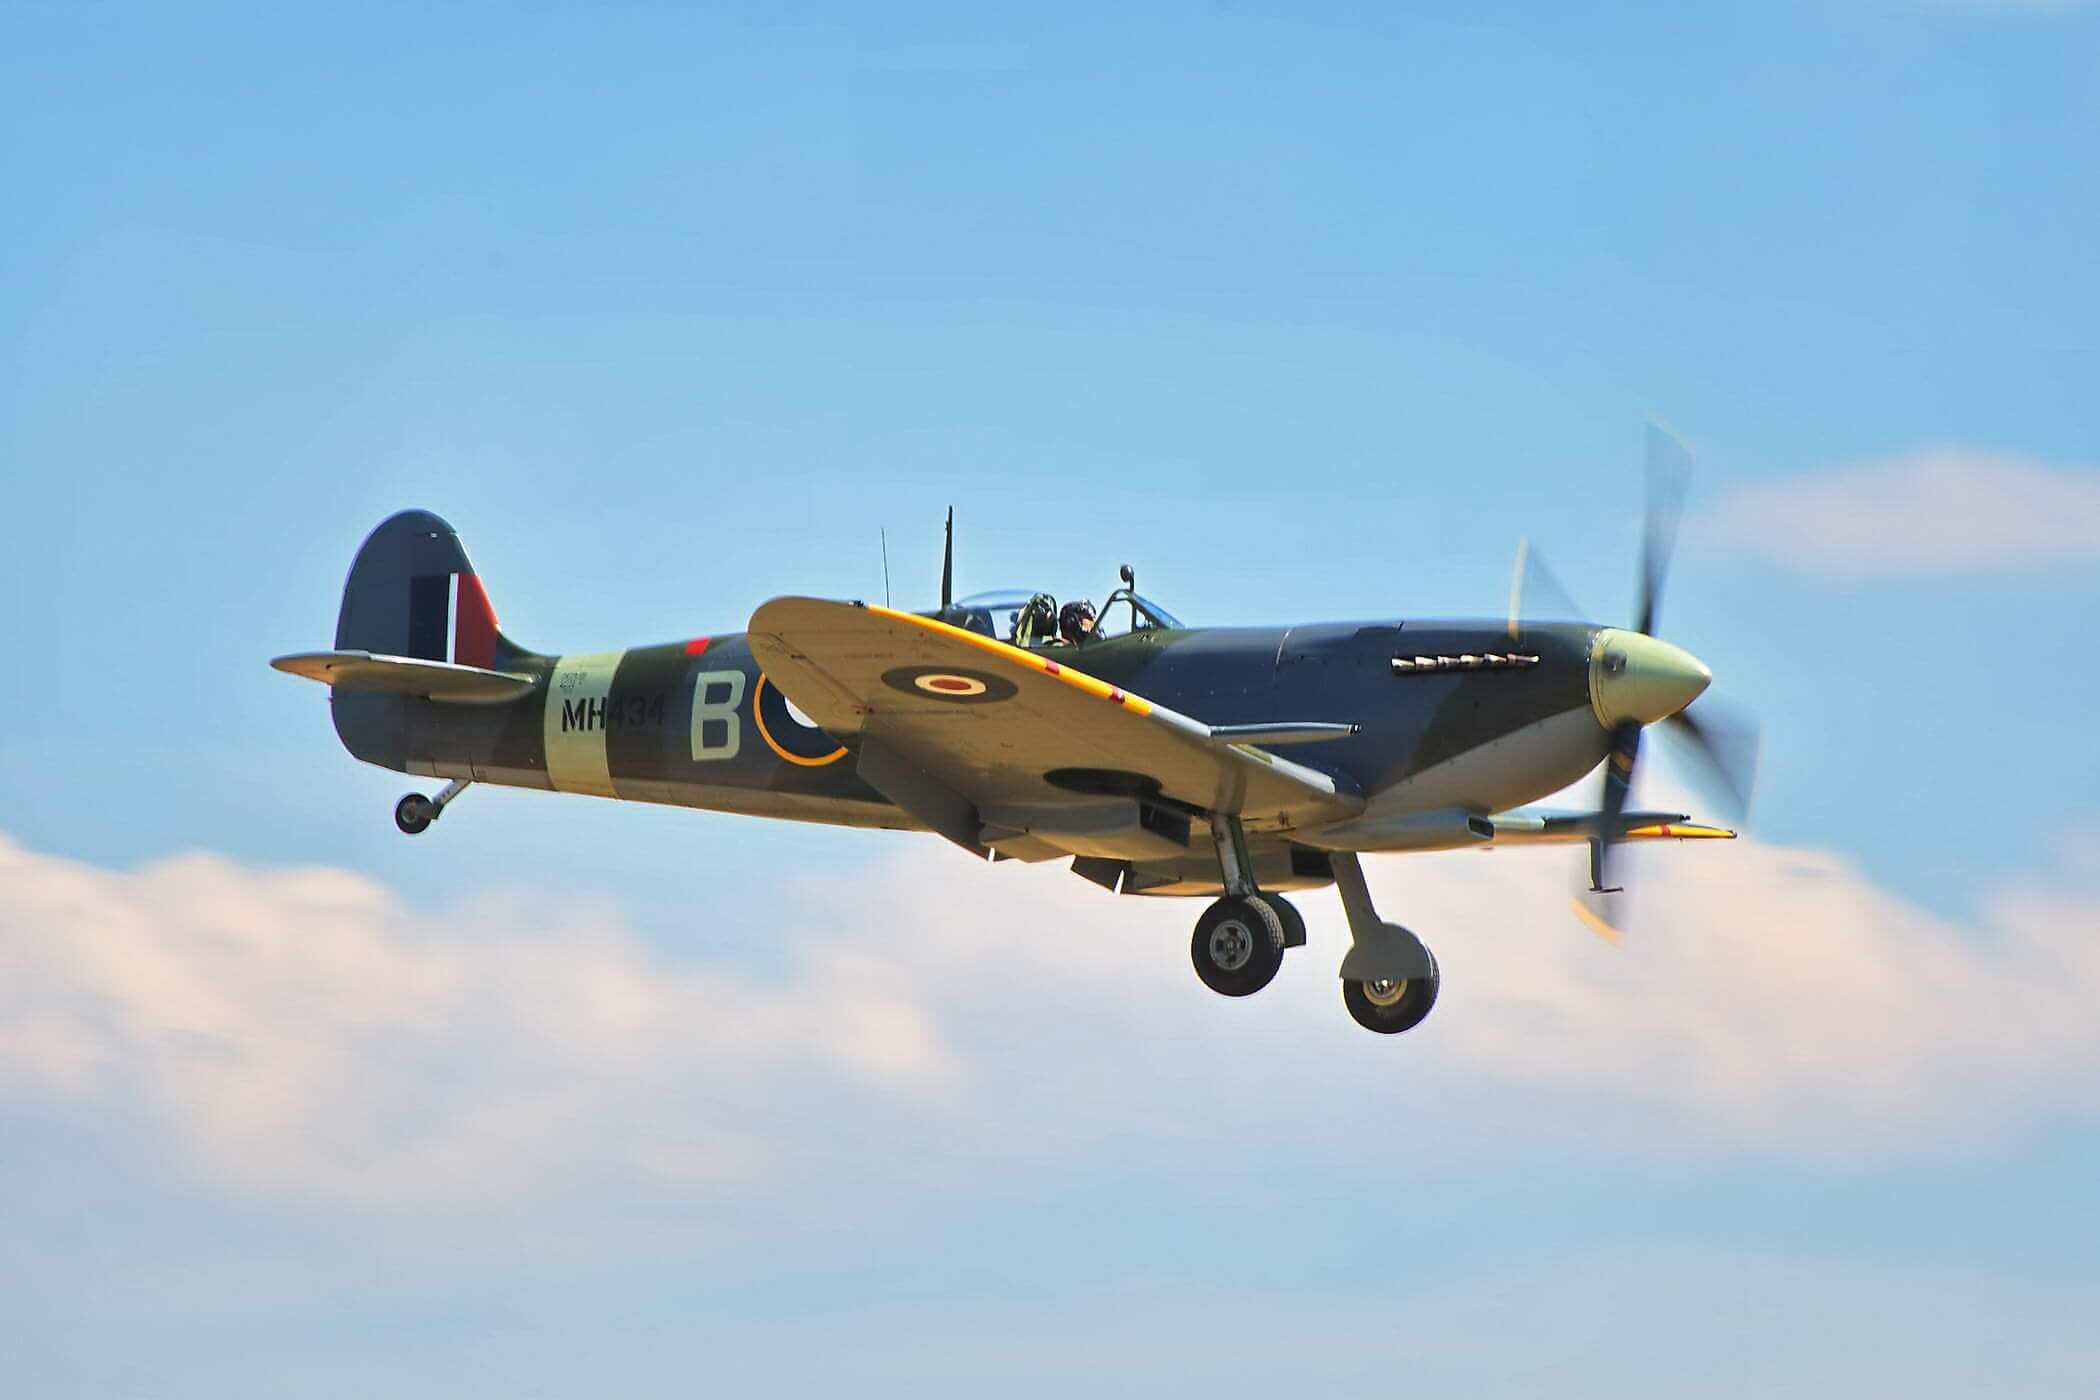 Spitfire F IX MH407